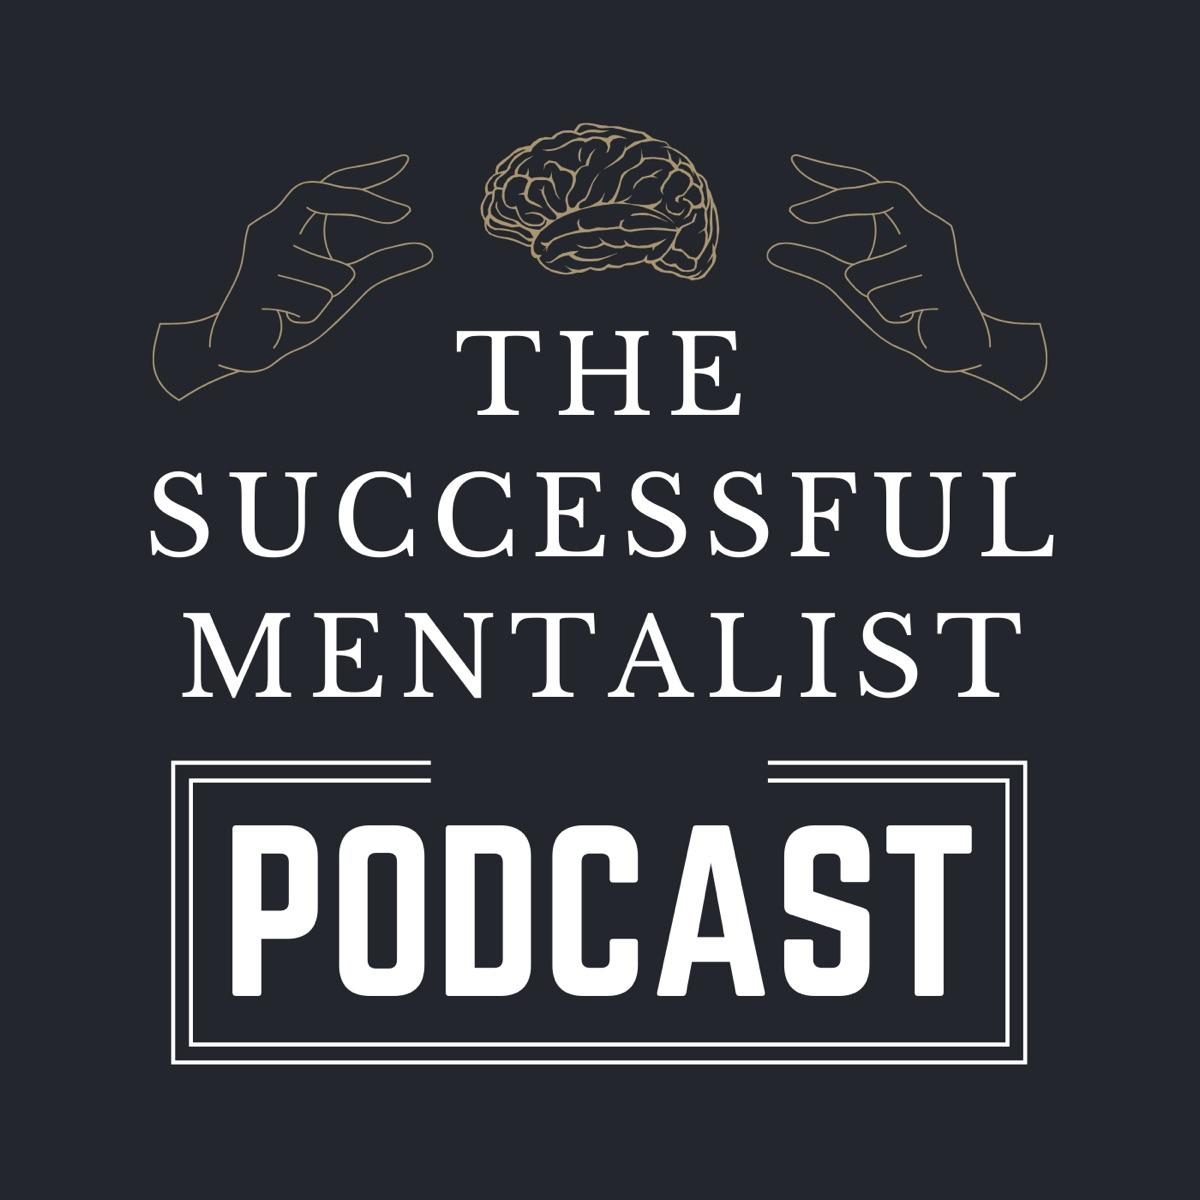 The Successful Mentalist